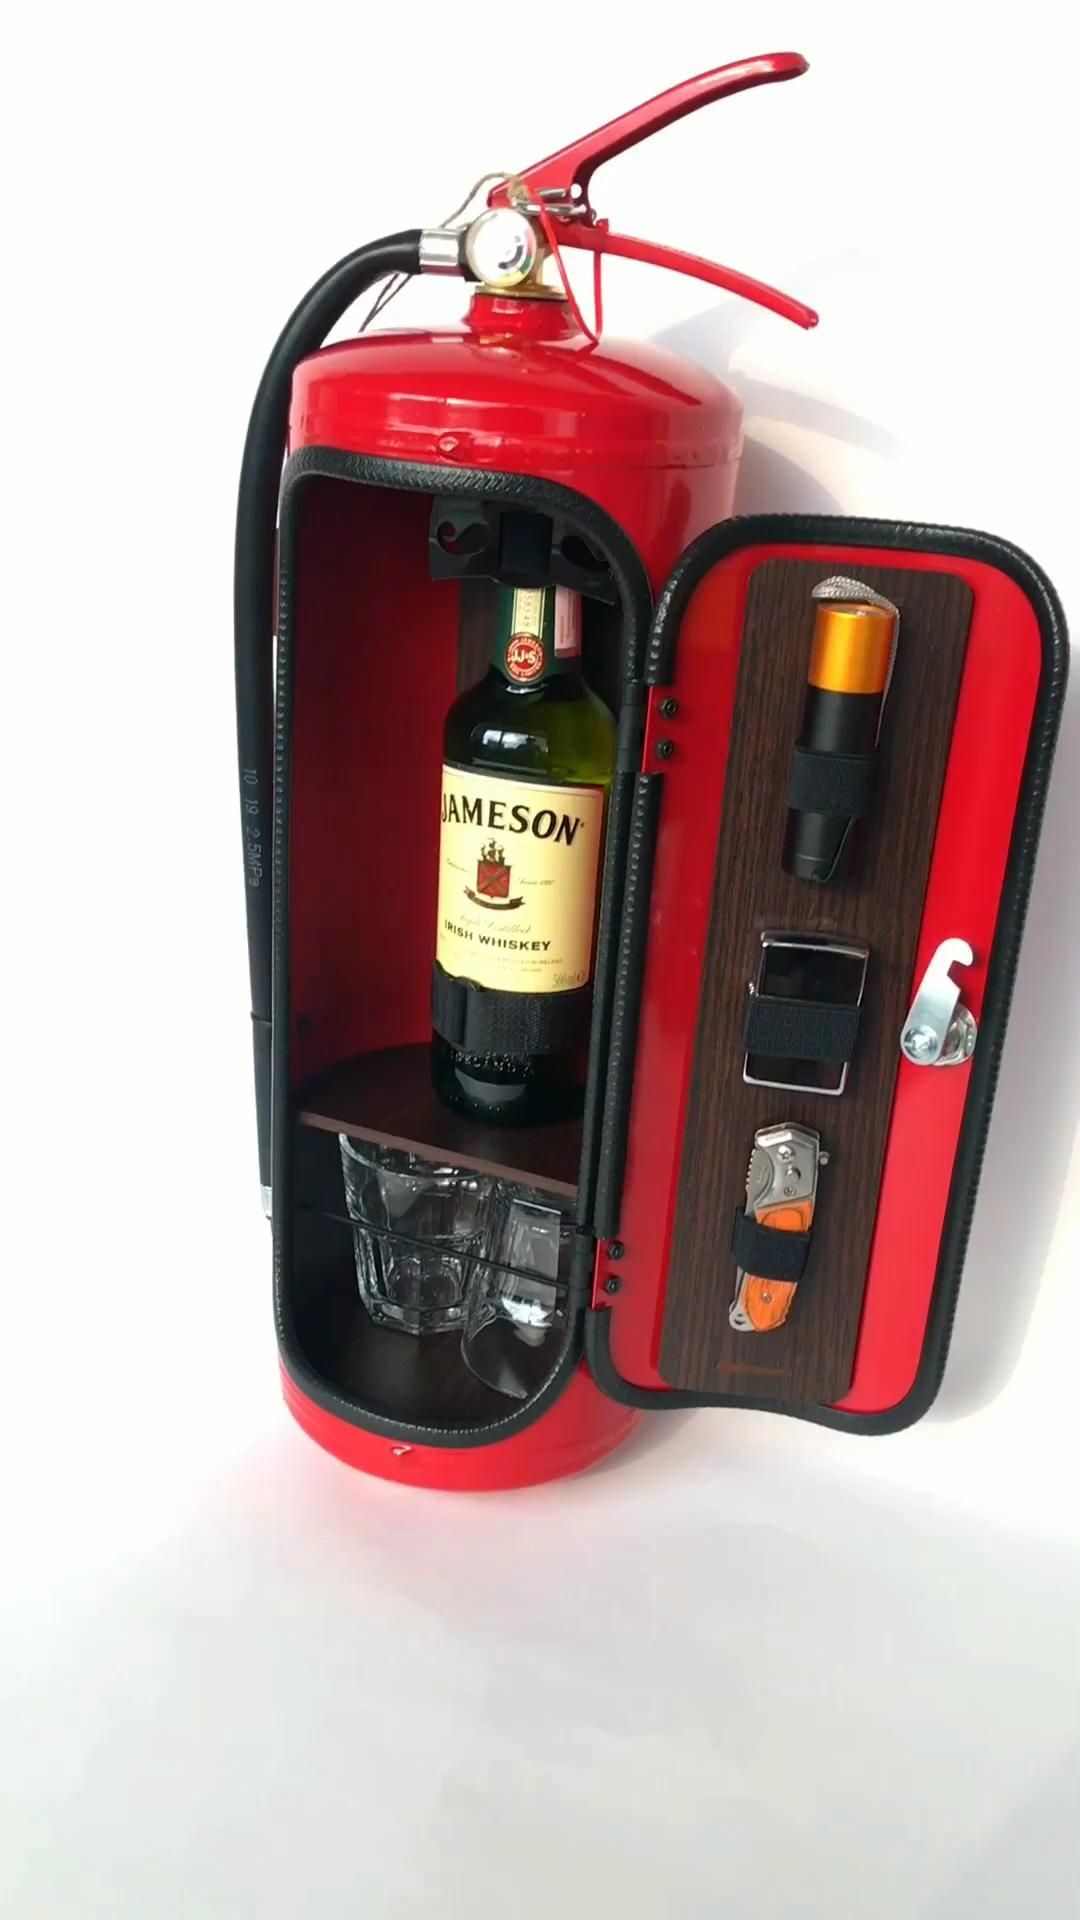 Fire Extinguisher Mini Bar Fireman Gift Firefighter Gift Etsy Video Video In 2020 Garage Gift Firemen Gifts Liquor Gifts